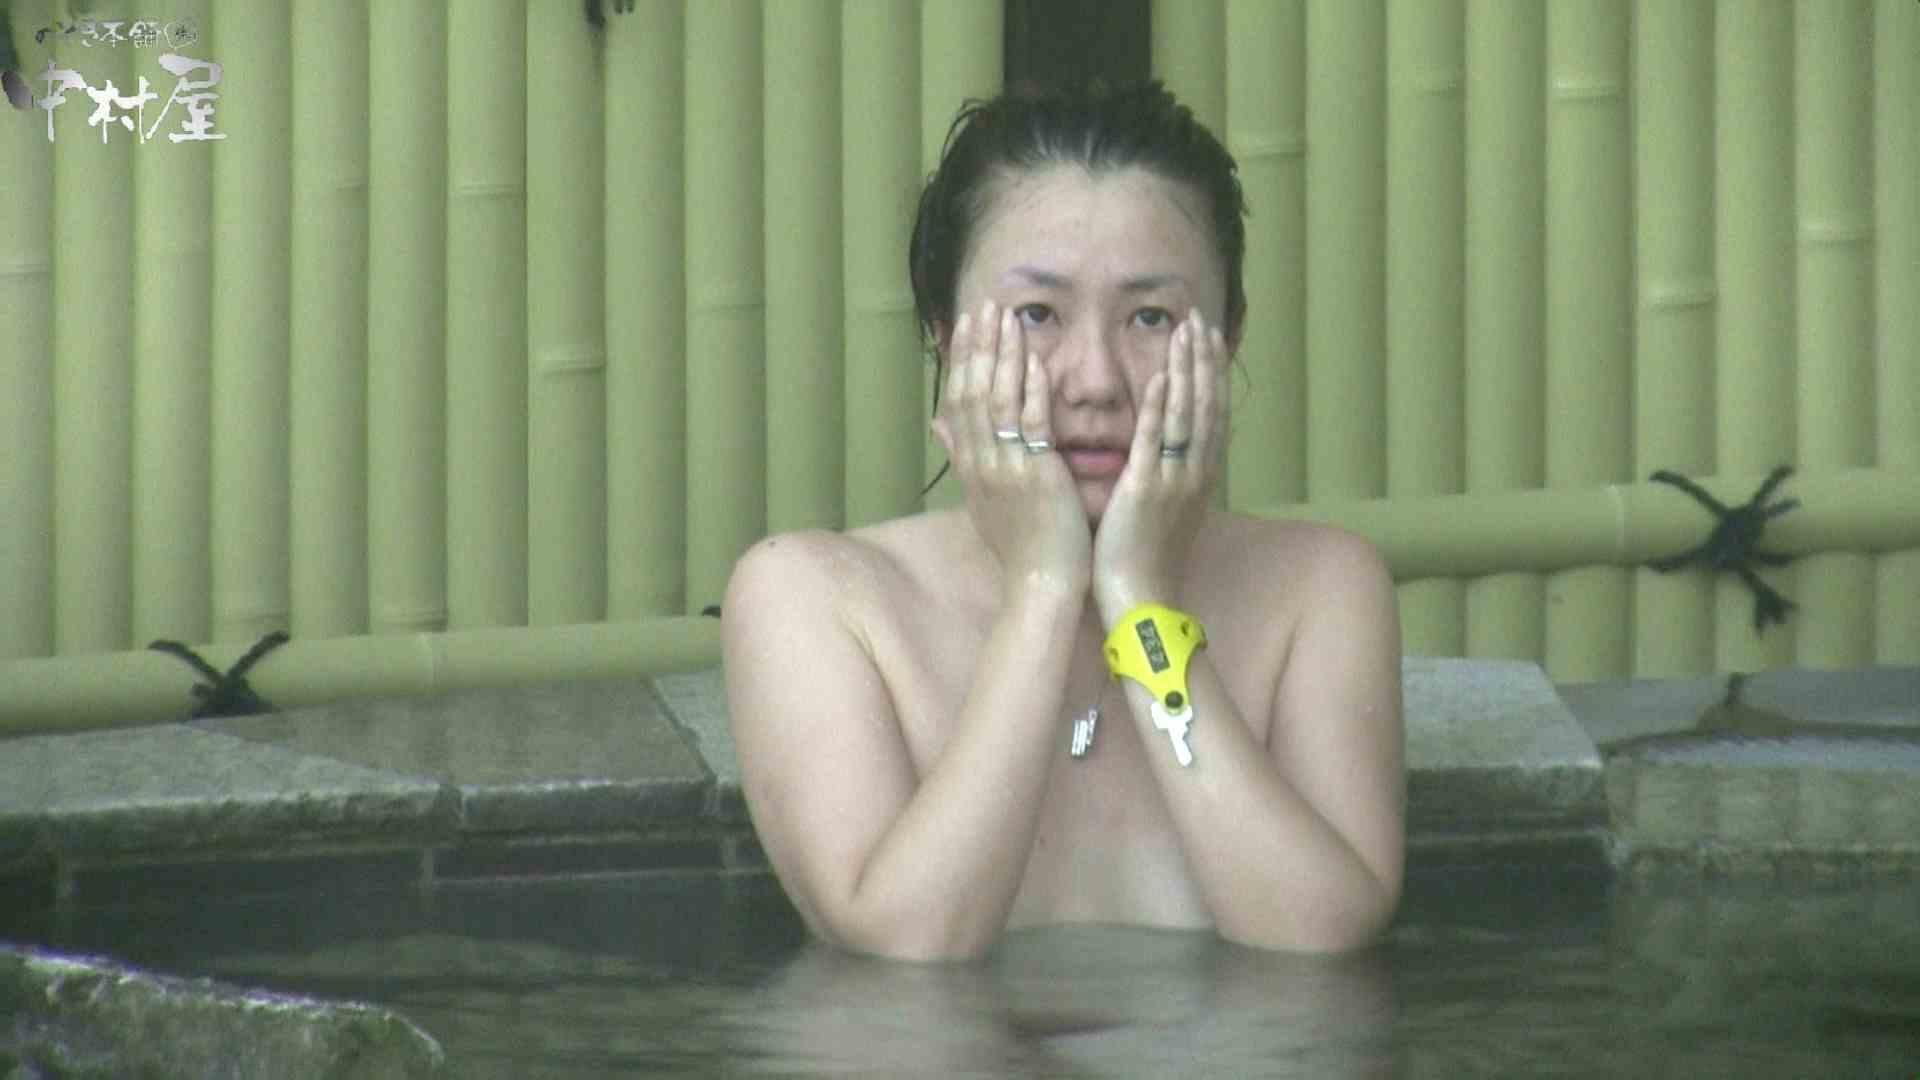 Aquaな露天風呂Vol.969 露天 のぞき動画画像 52画像 17